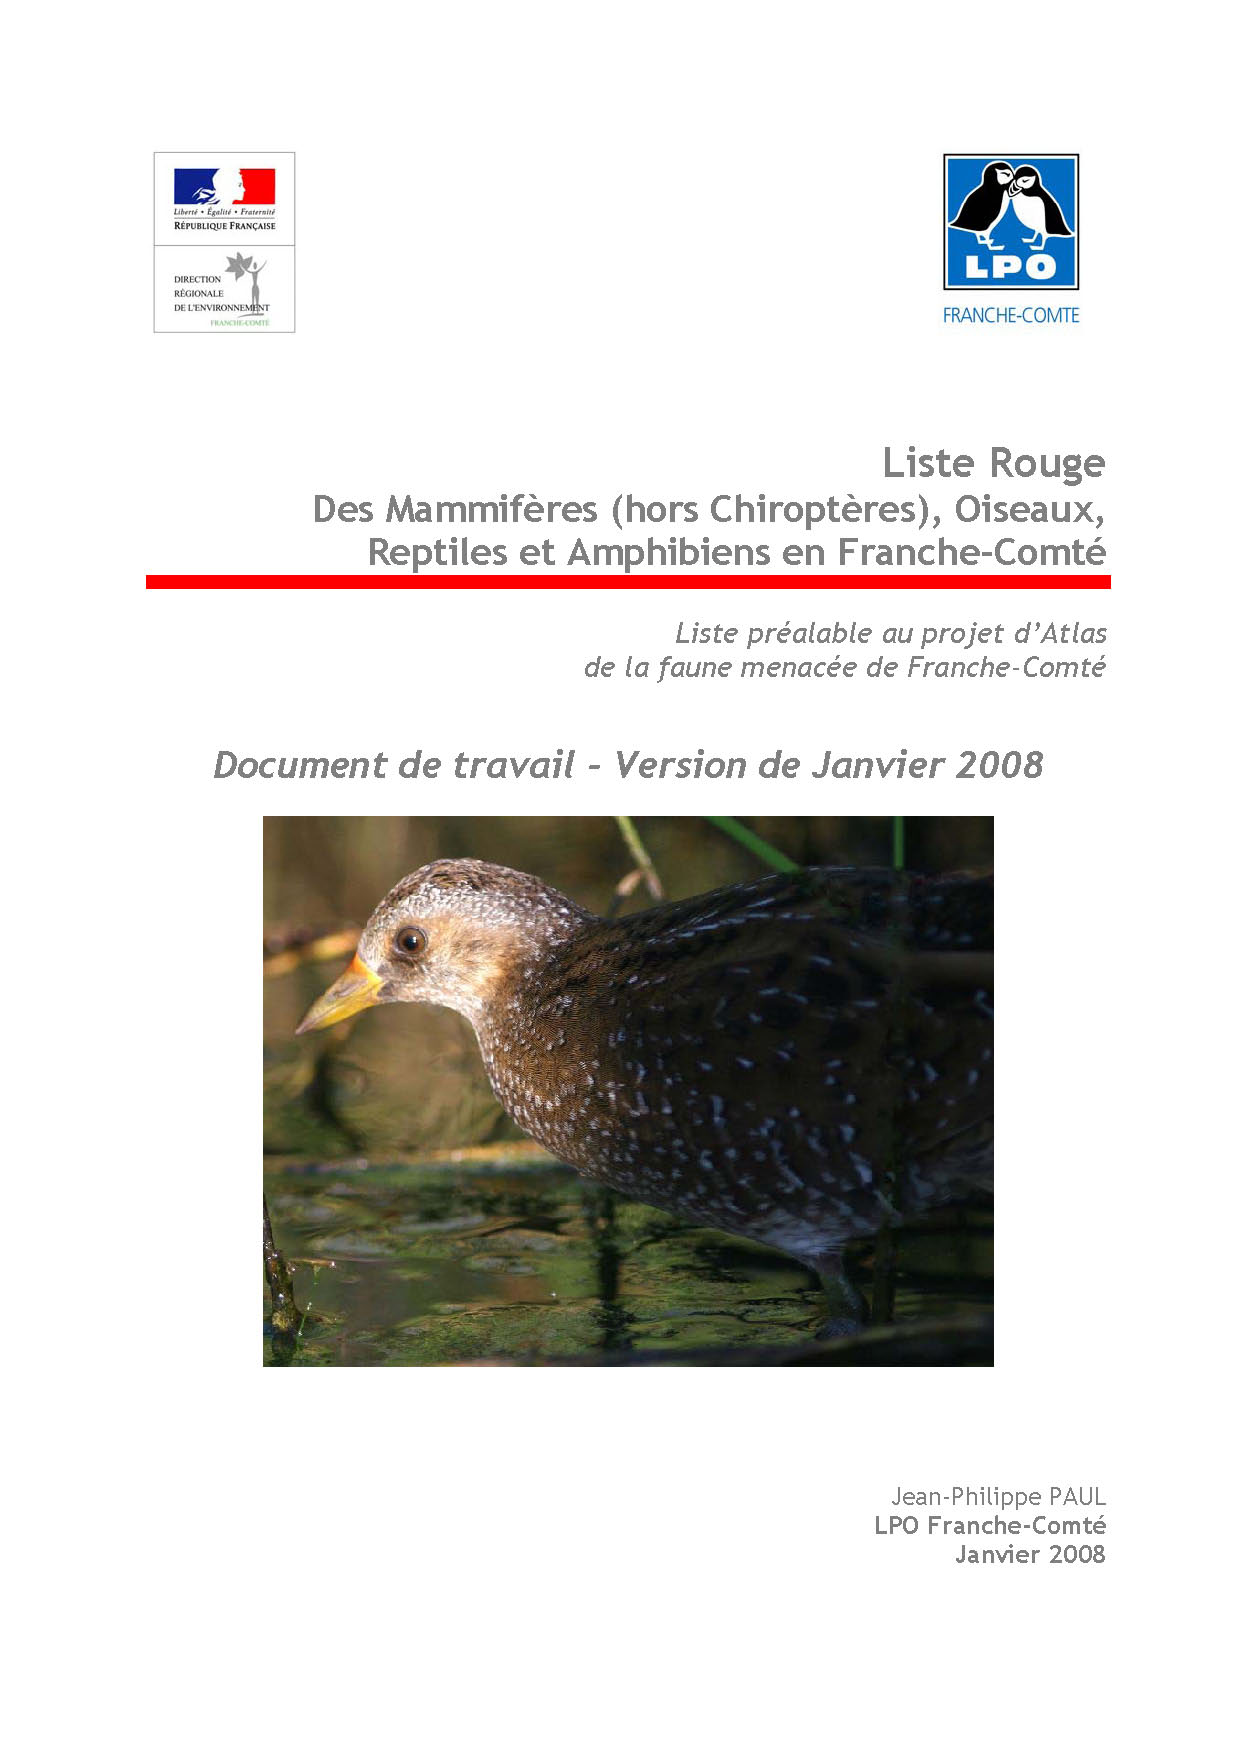 http://files.biolovision.net/franche-comte.lpo.fr/userfiles/proteger/Protectionespces/Liste-rouge-vertebres-terrestres-Franche-Comte-Jan-2008.pdf